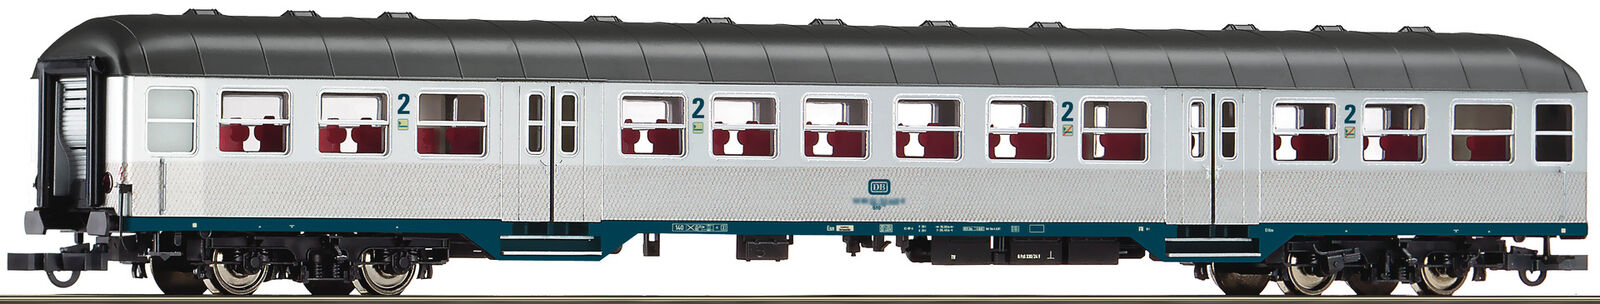 Roco 64661 h0 regional train car 2. class DB, dc